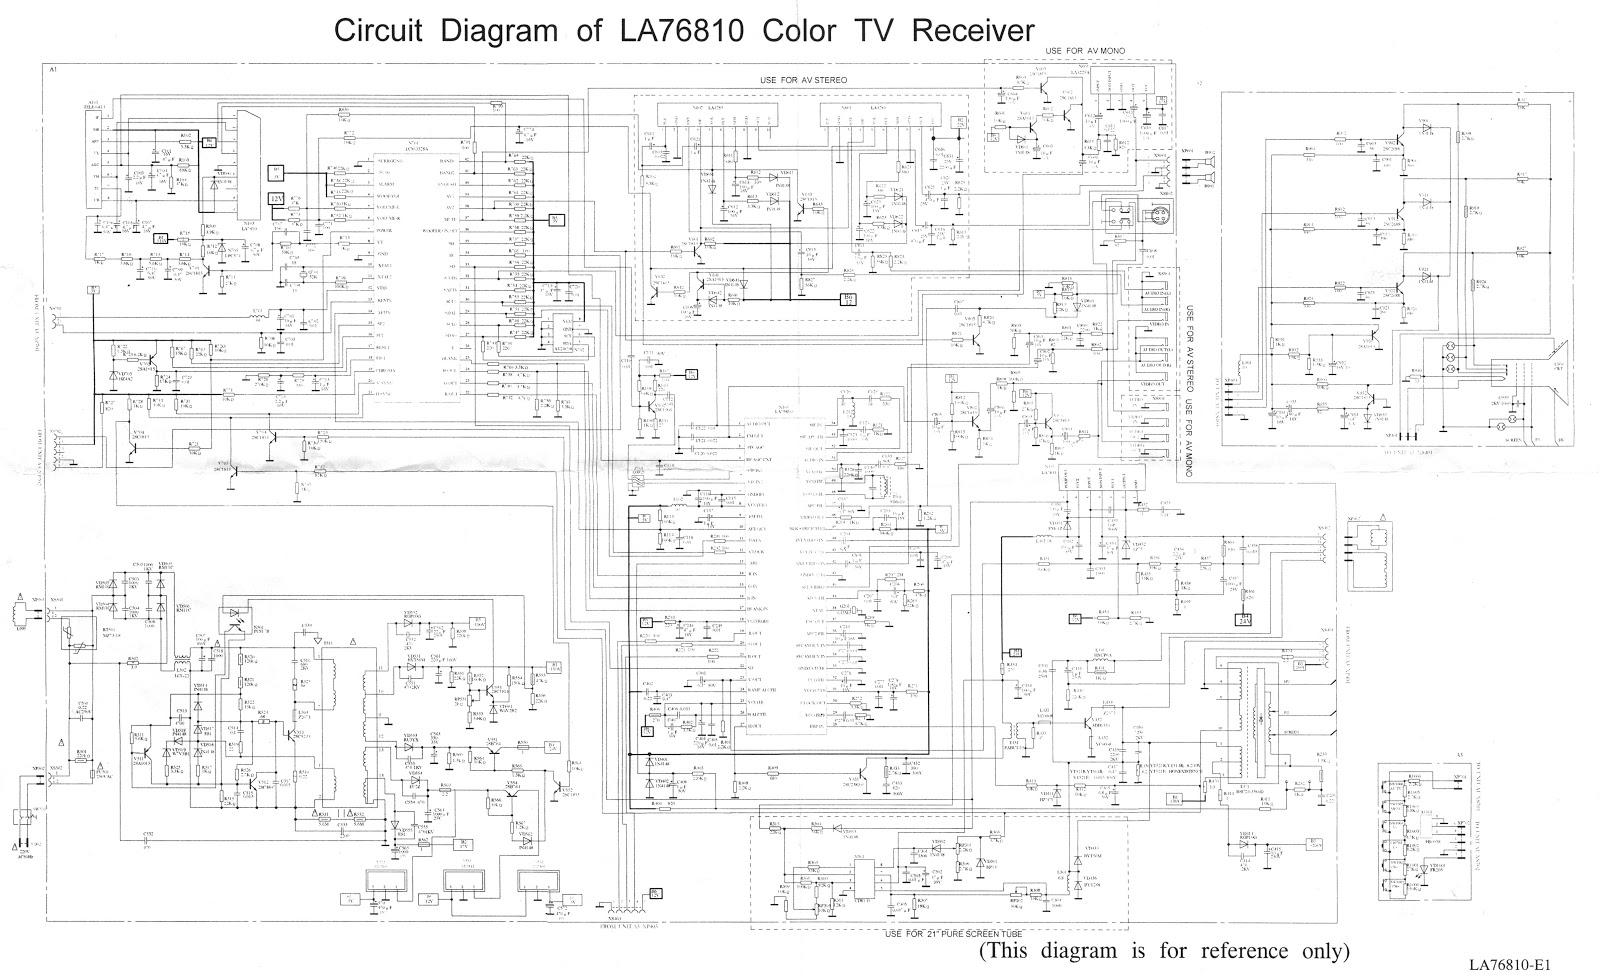 SERVIS TV SALATIGA (lcdledtabung): Circuit diagram of LA